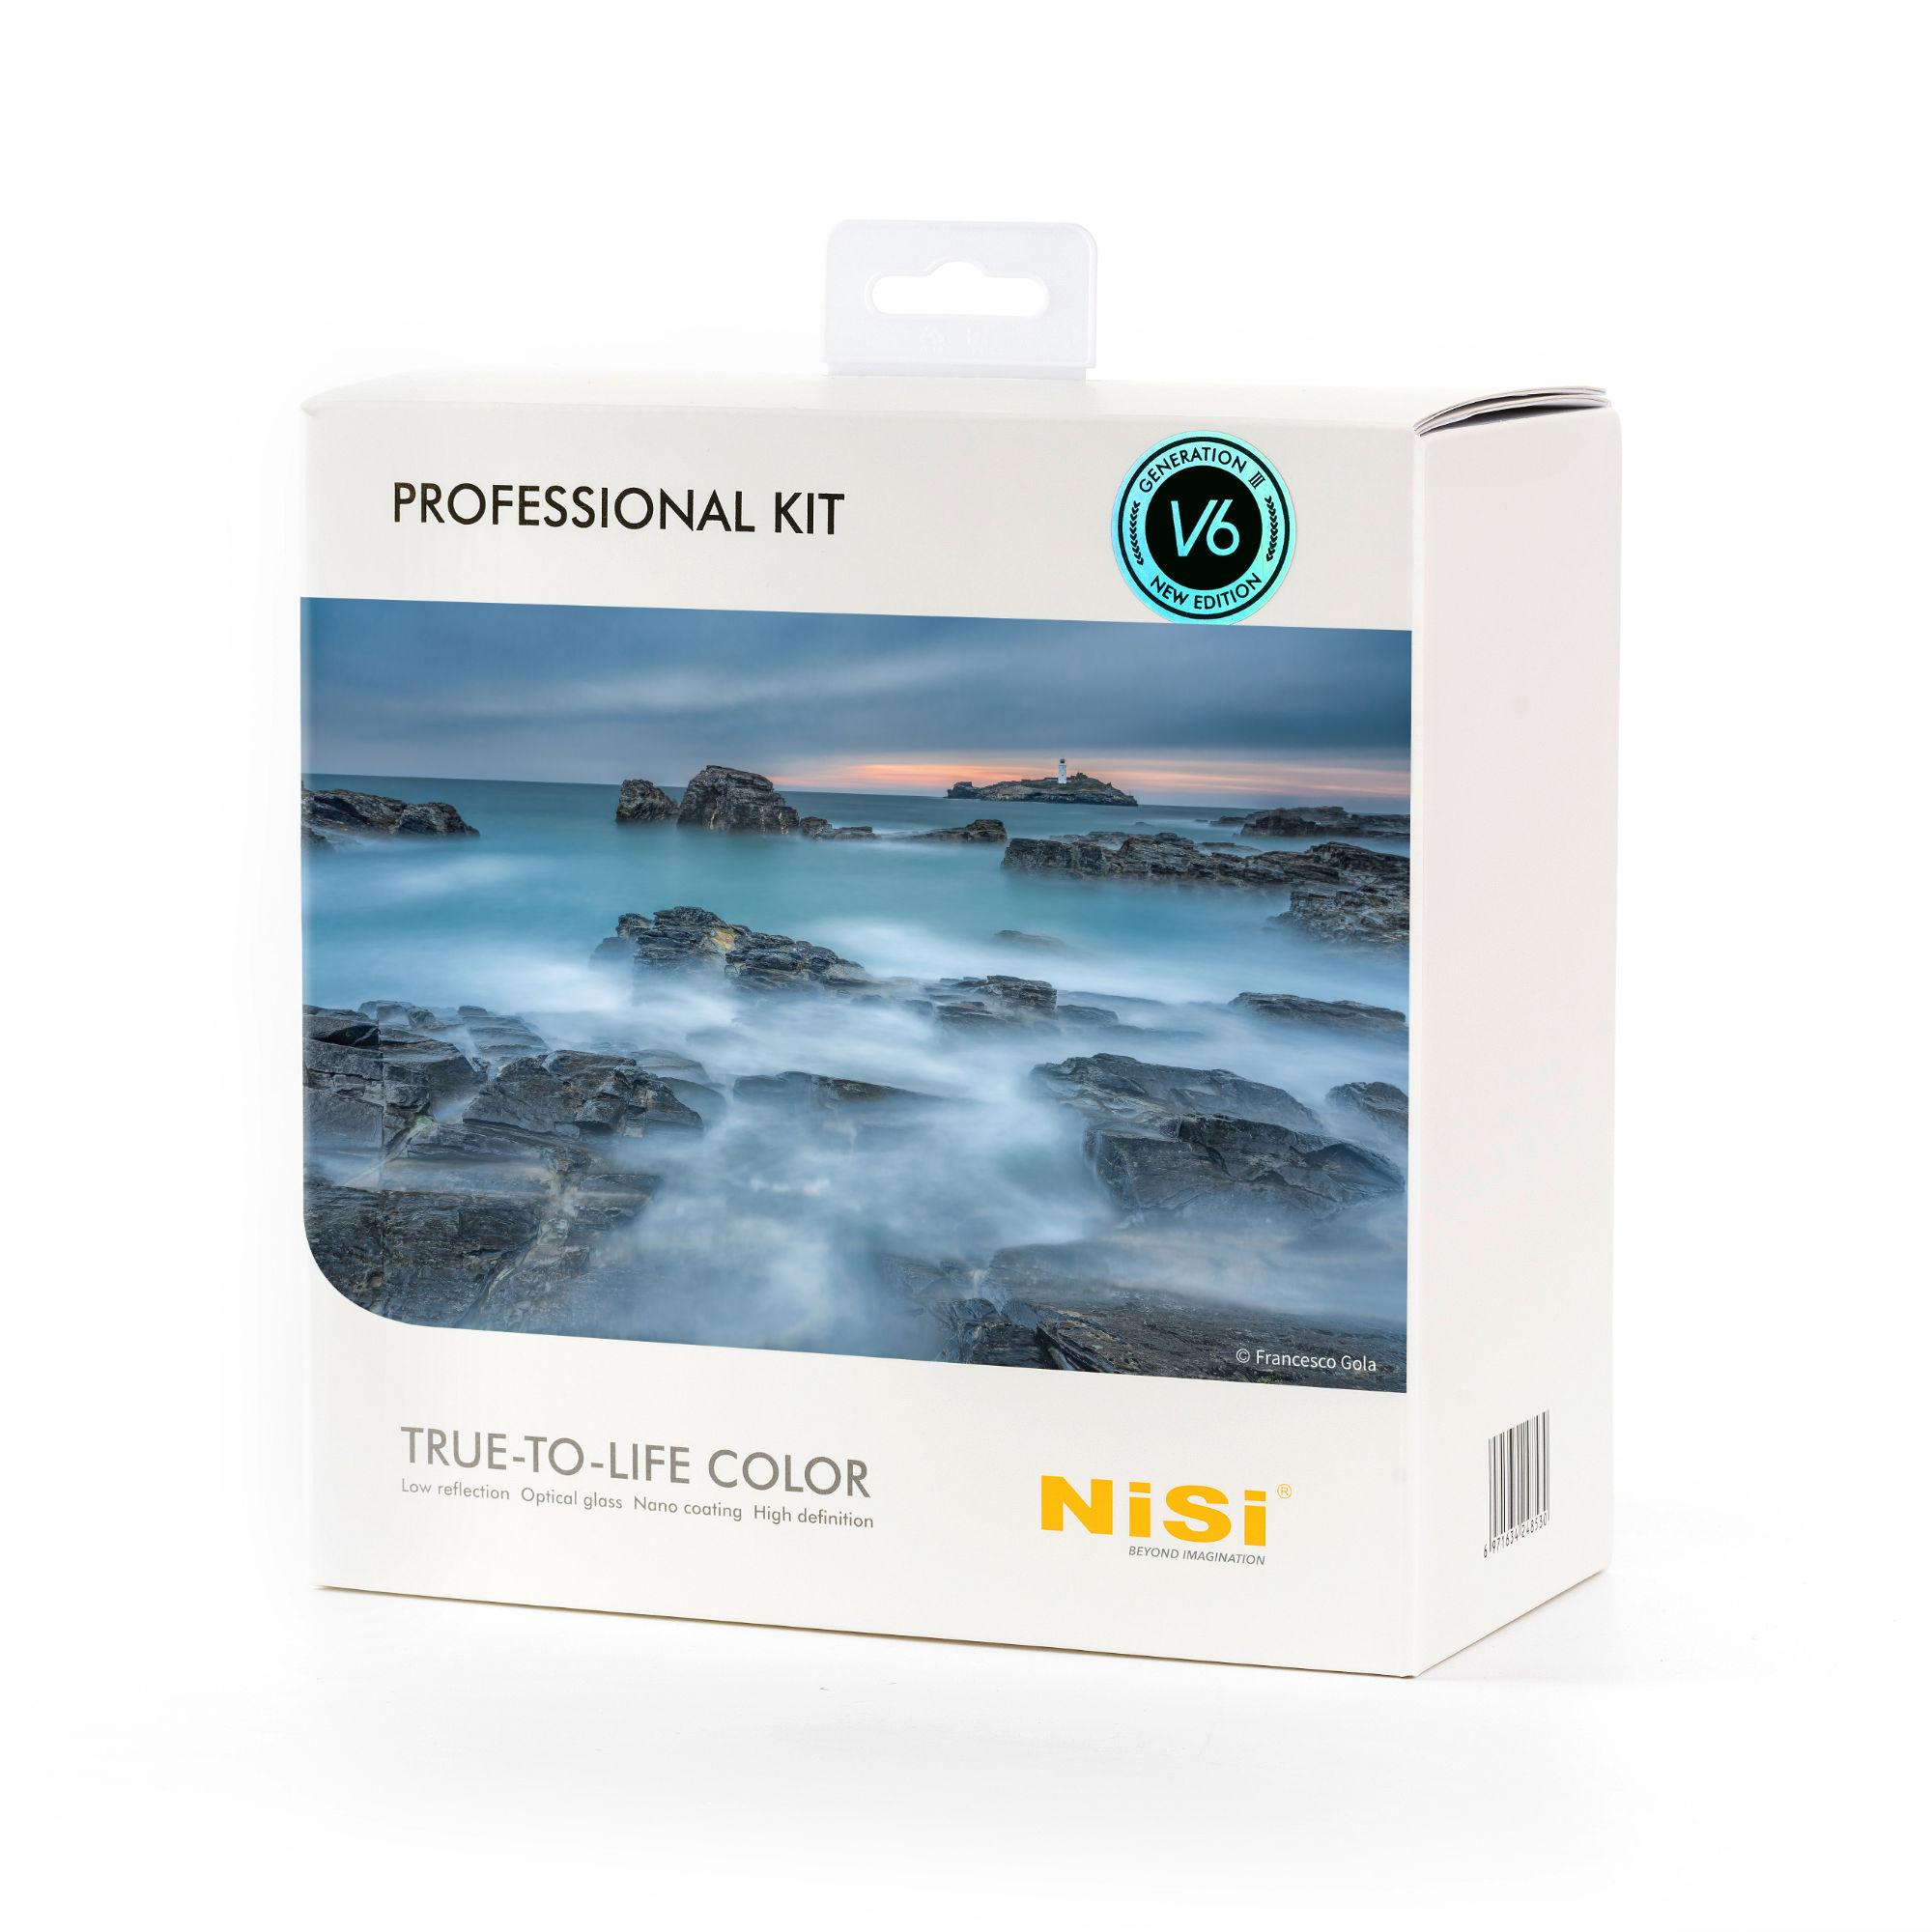 Professional-Kit